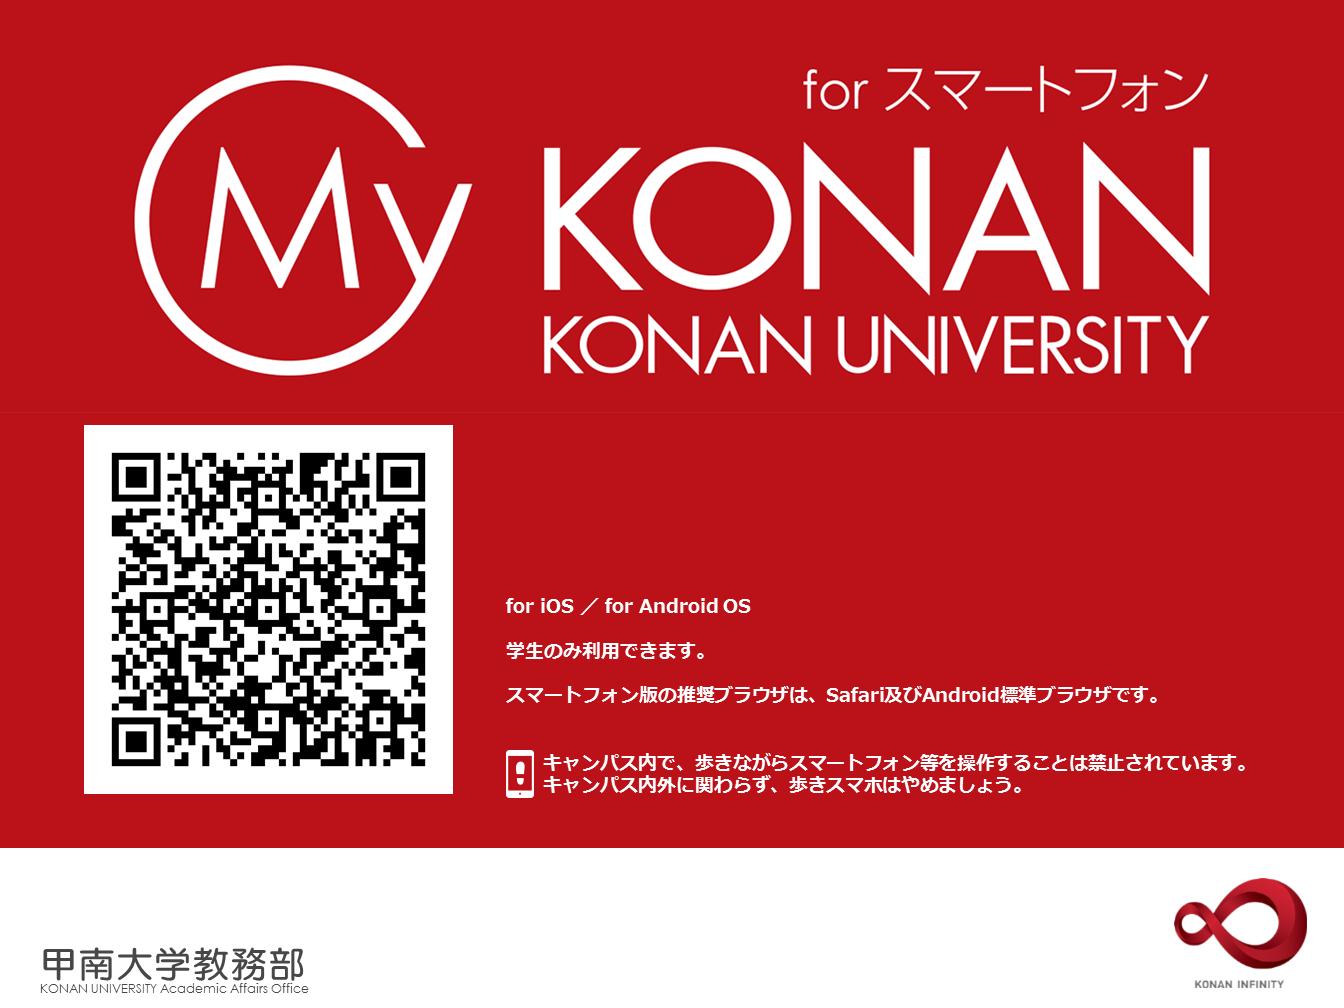 My KONAN for スマートフォン